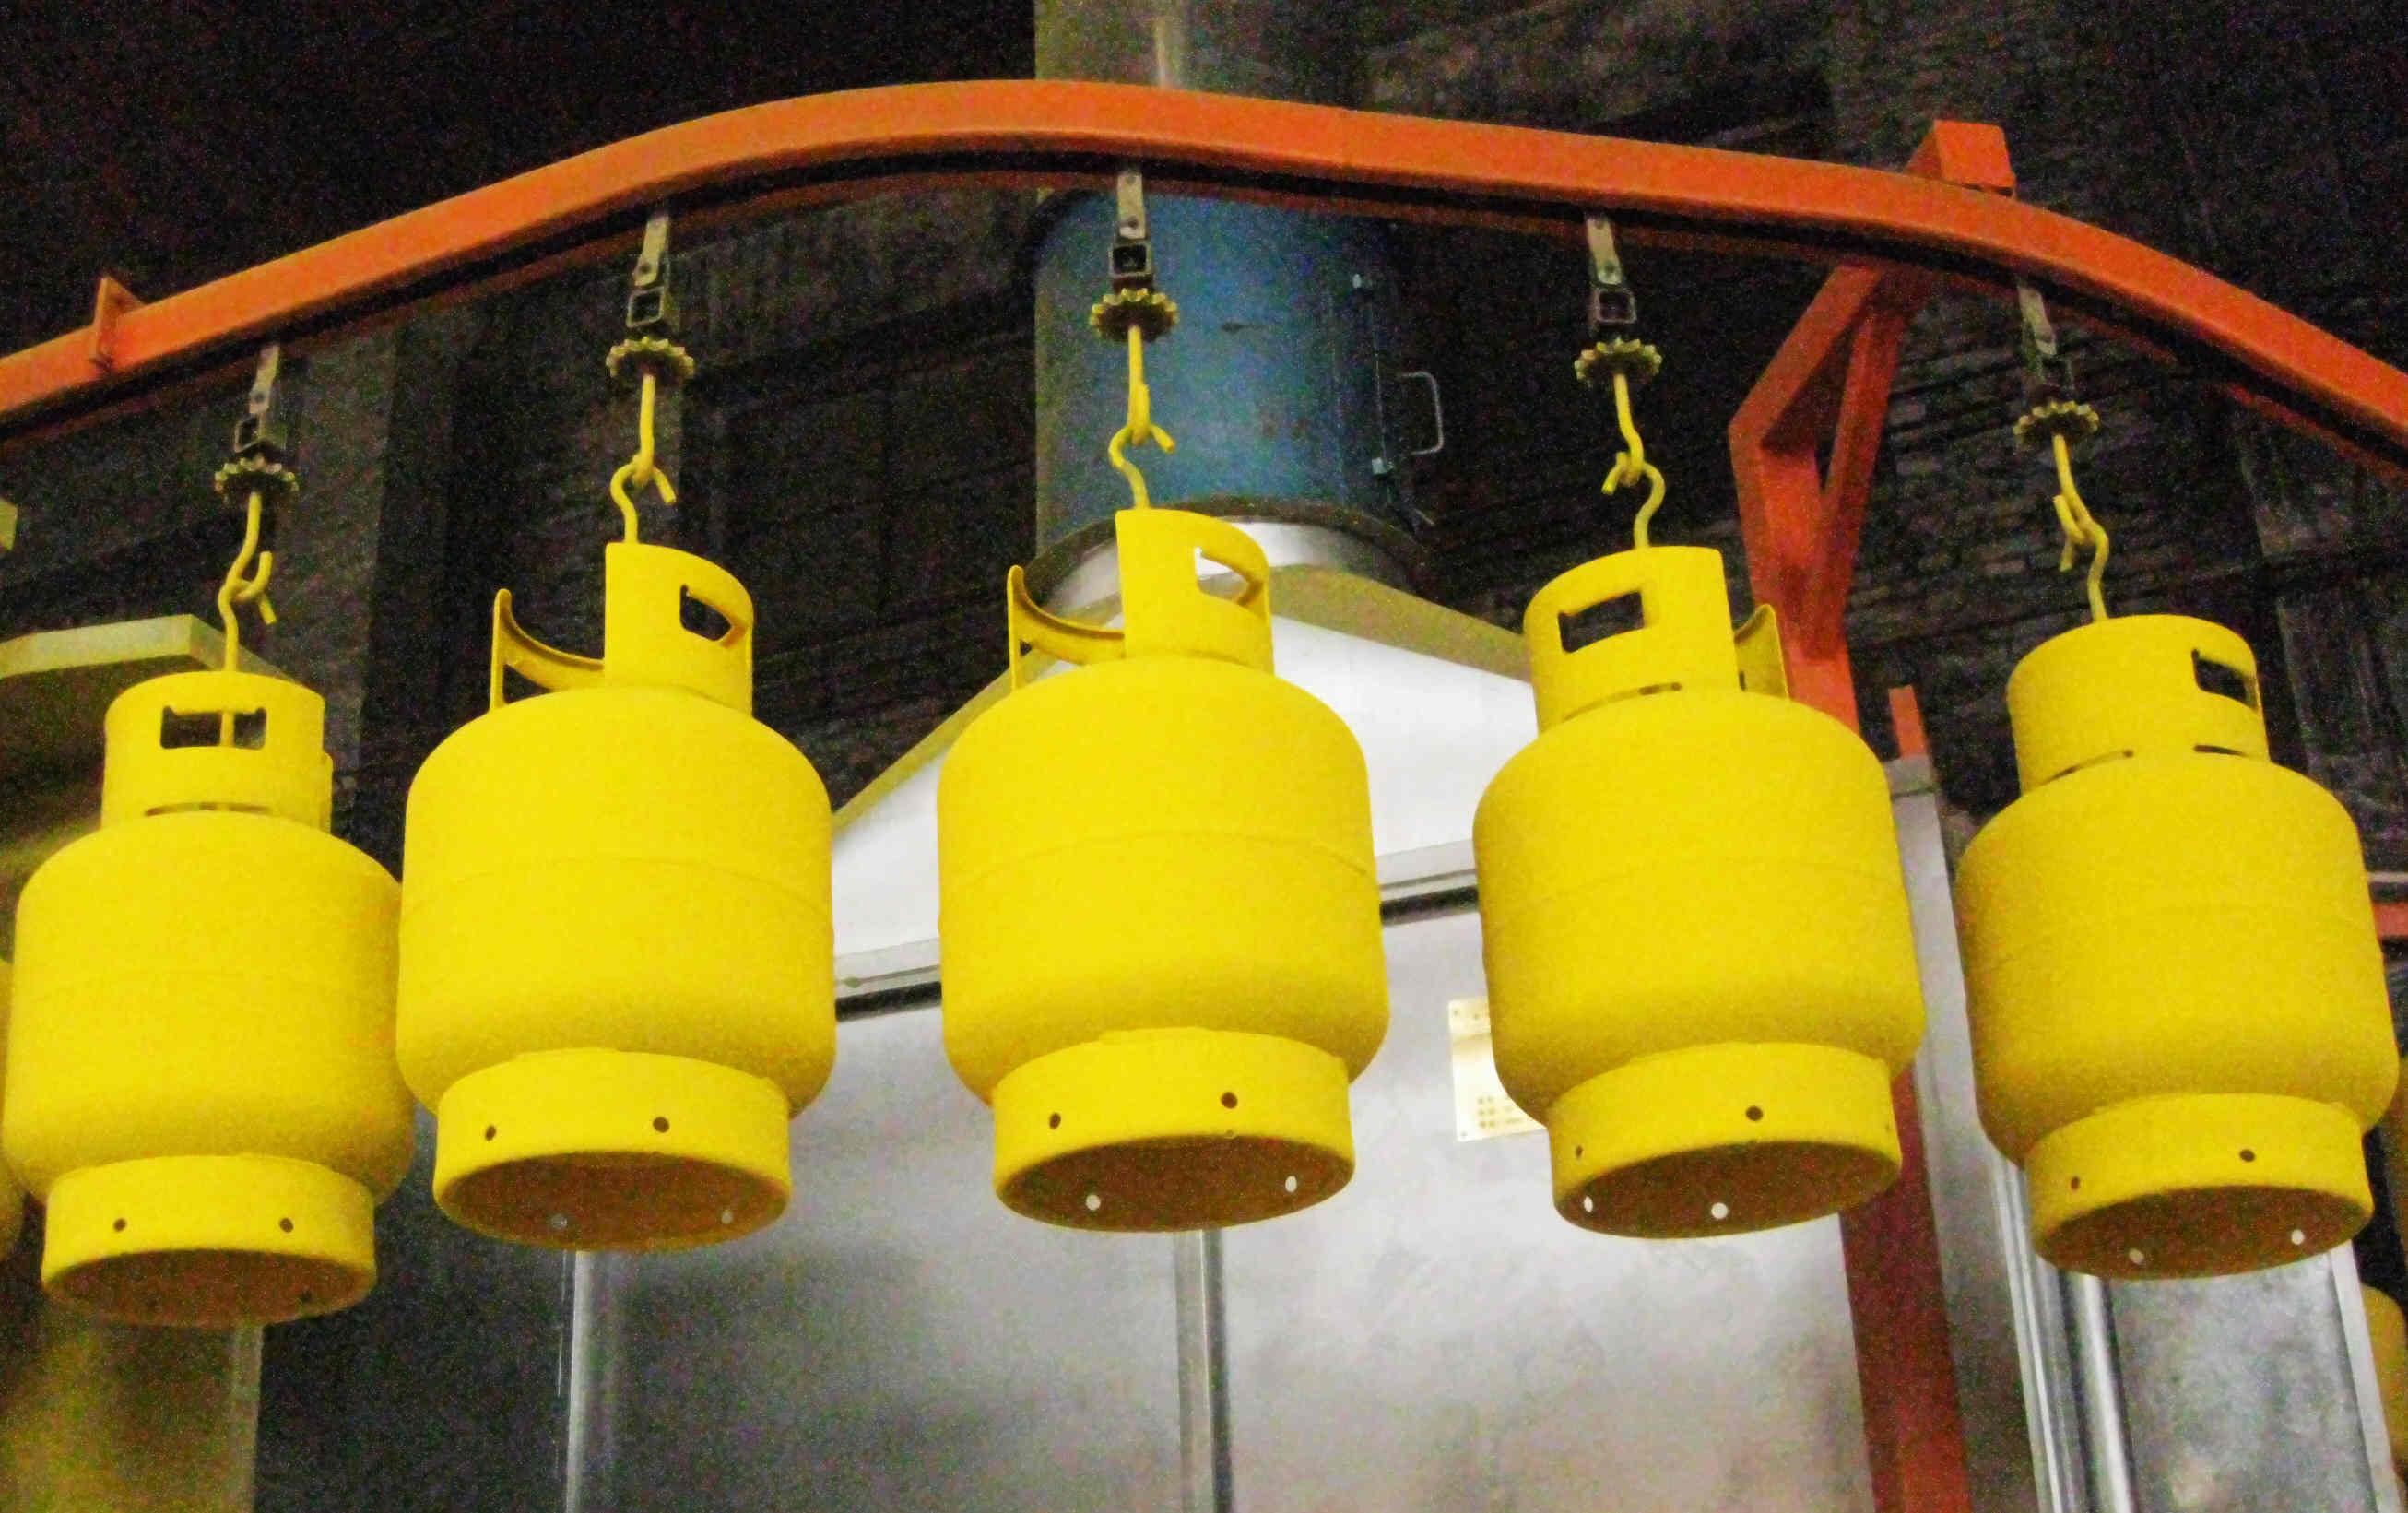 35.7L LPG Cylinder